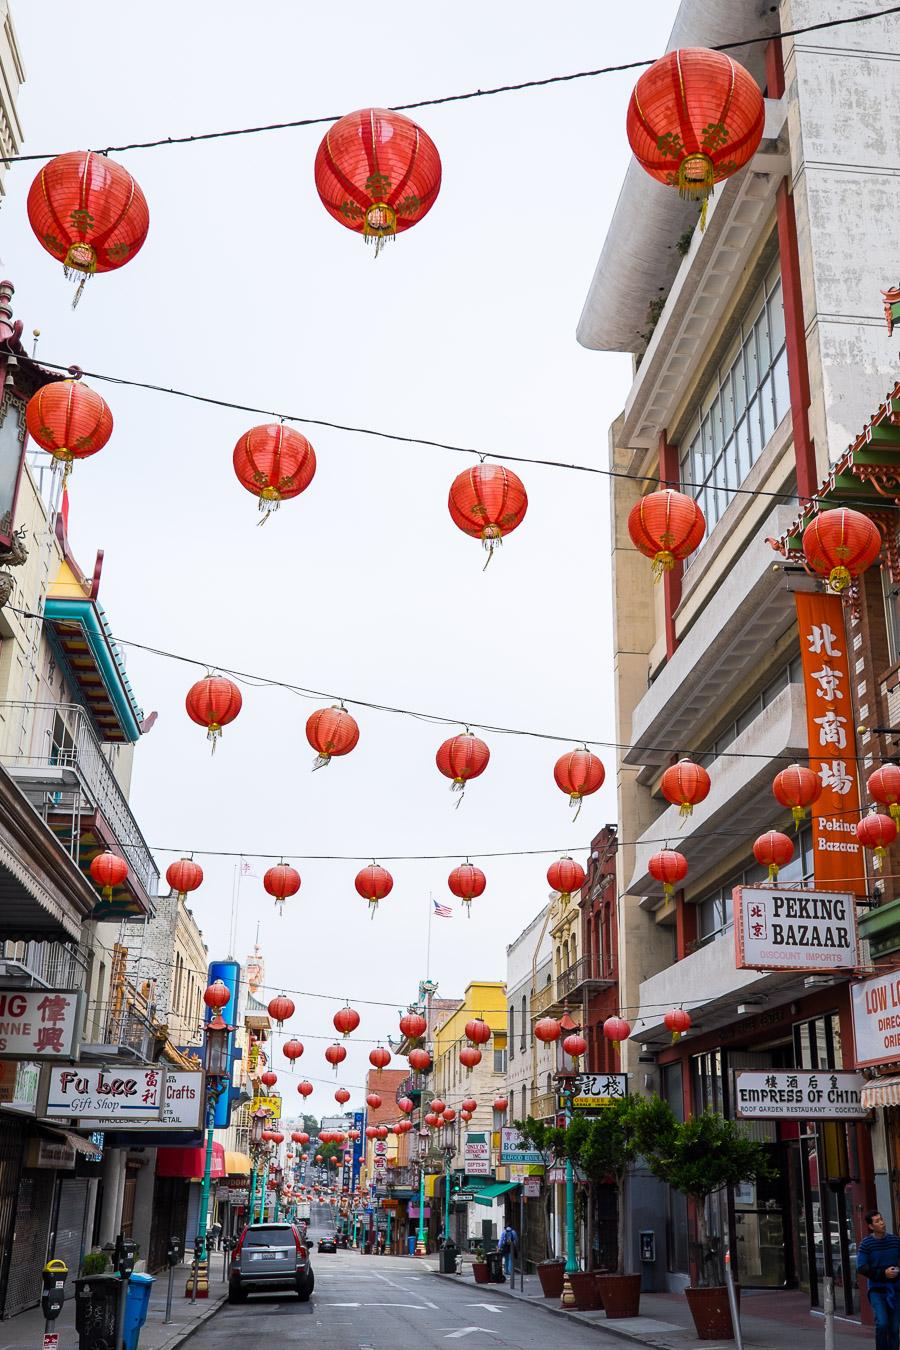 Lanterns on Grant Street, Chinatown